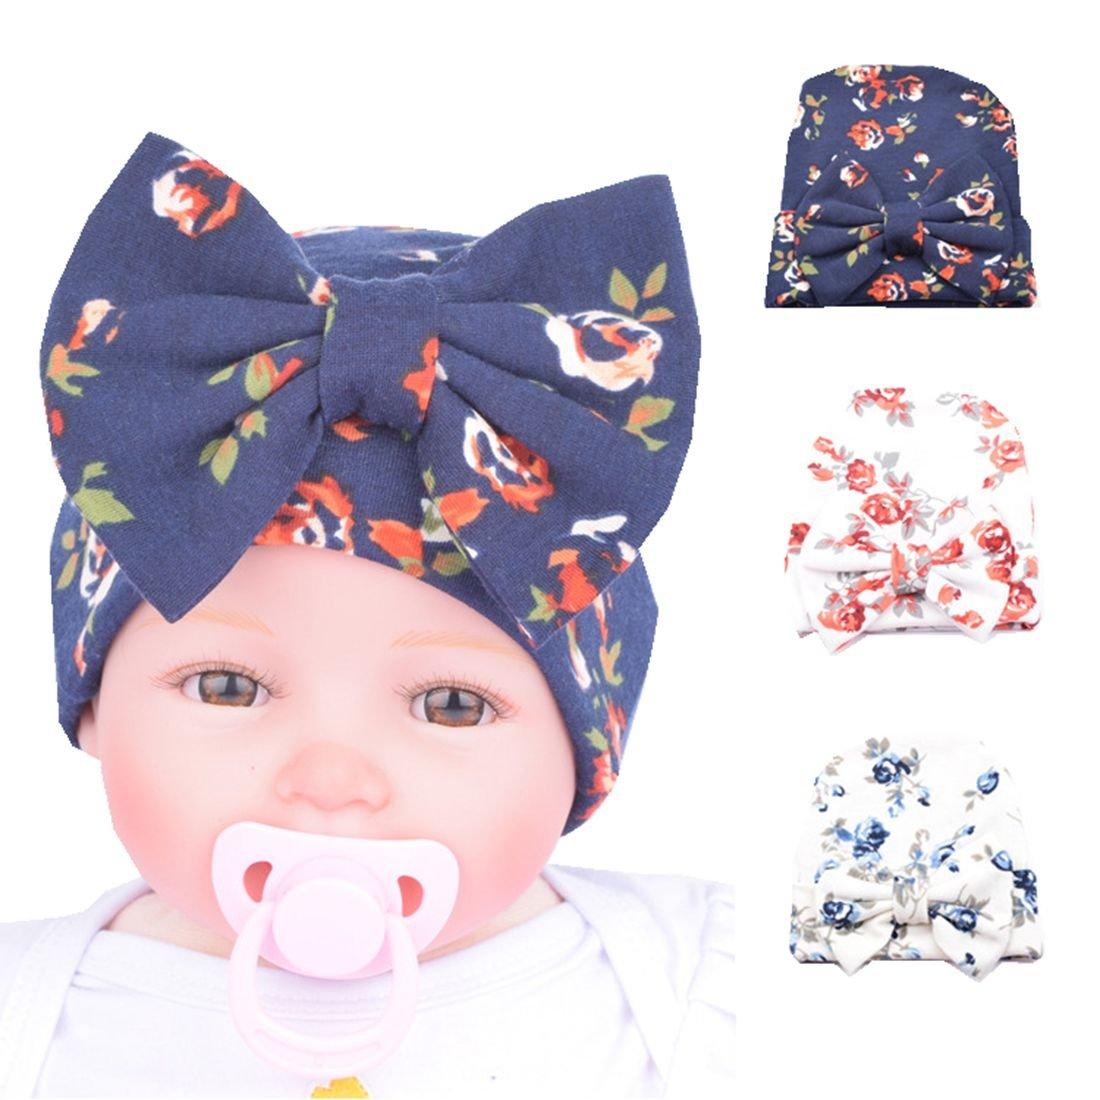 Blue Newborn Hospital Hat Cap with Big Bow Comfort For Infant Baby Girls 3 Pcs Yzjcafriz